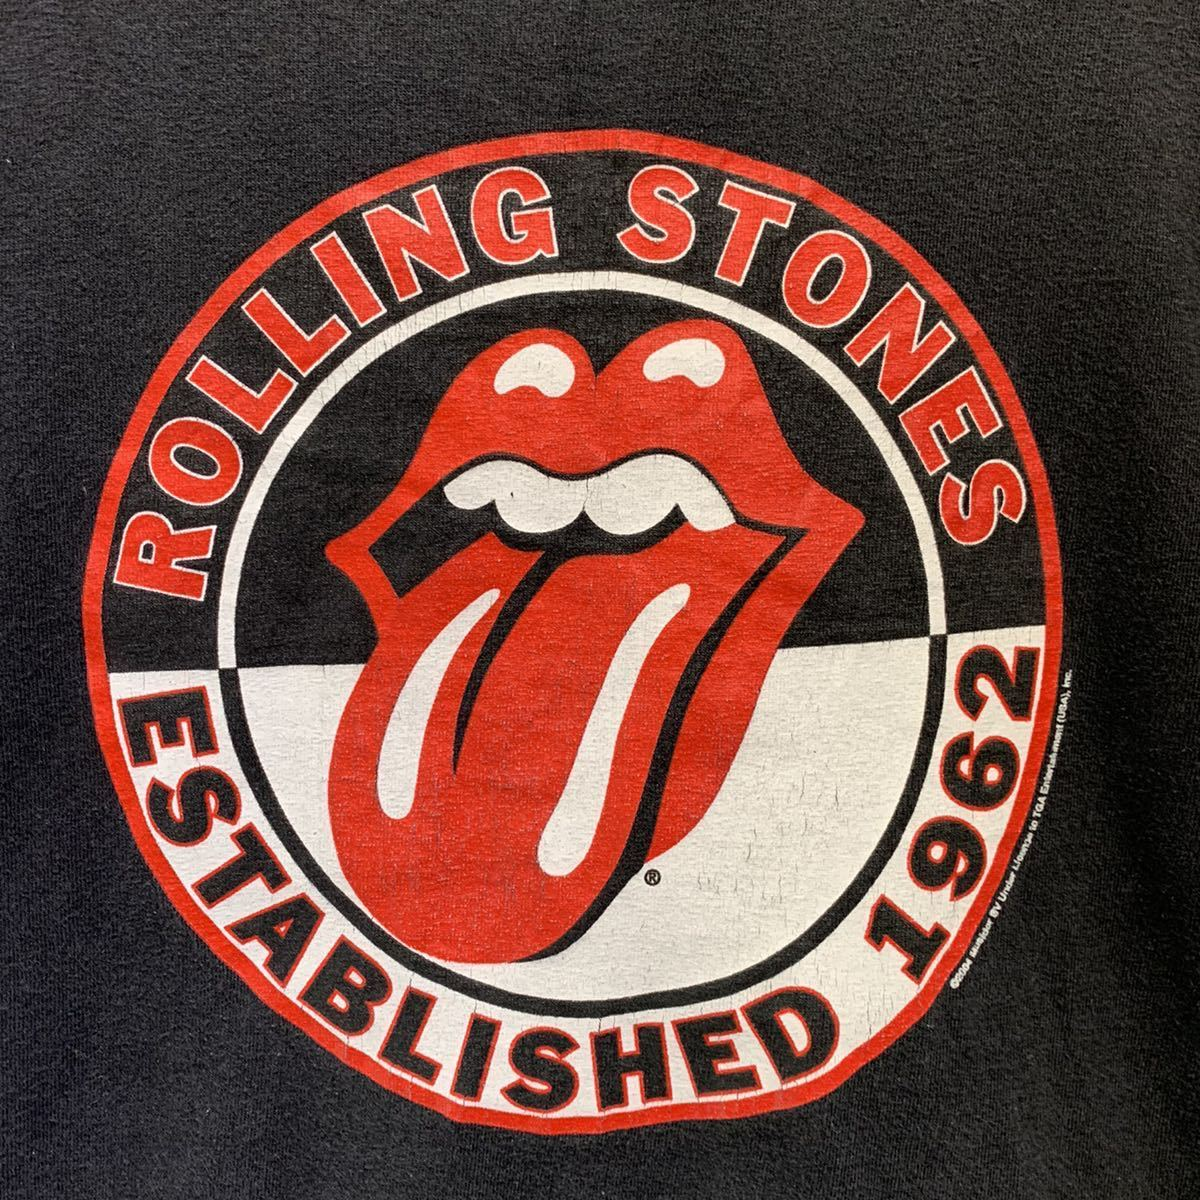 '04 Rolling Stones バンド Tシャツ ヴィンテージ / 古着 バンT USA AC/DC Guns N' Roses Metallica Pink Floyd SLAYER 80s 90s